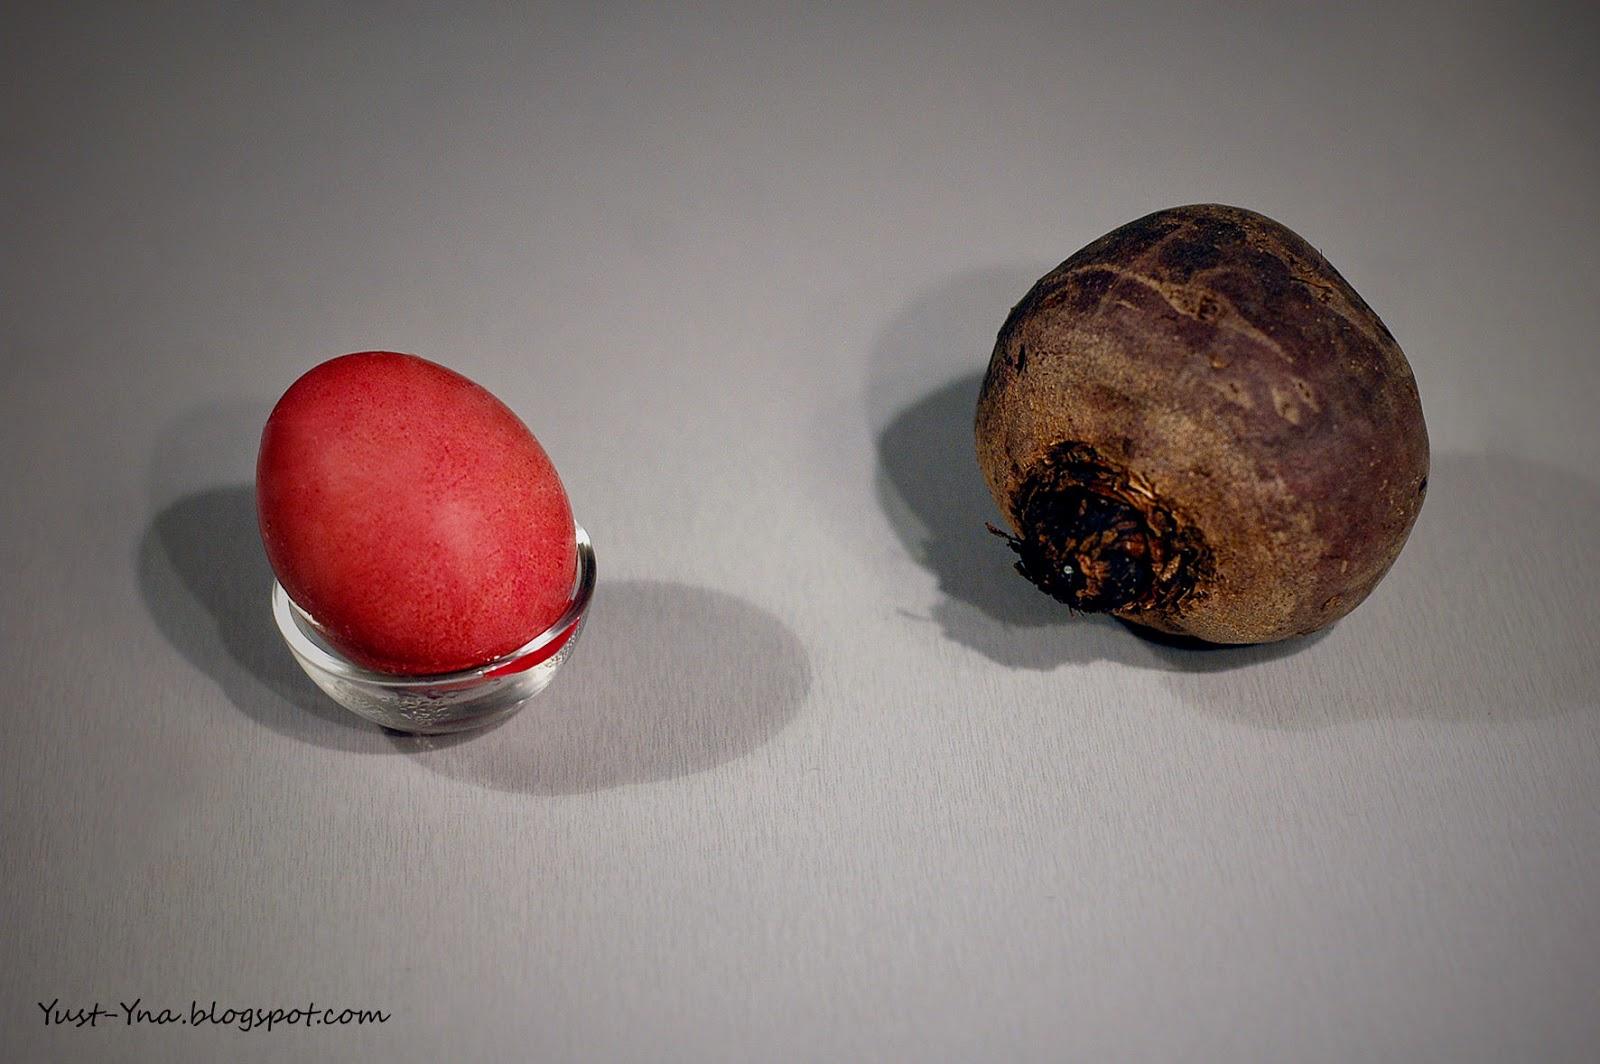 Farbowanie jajek burakiem